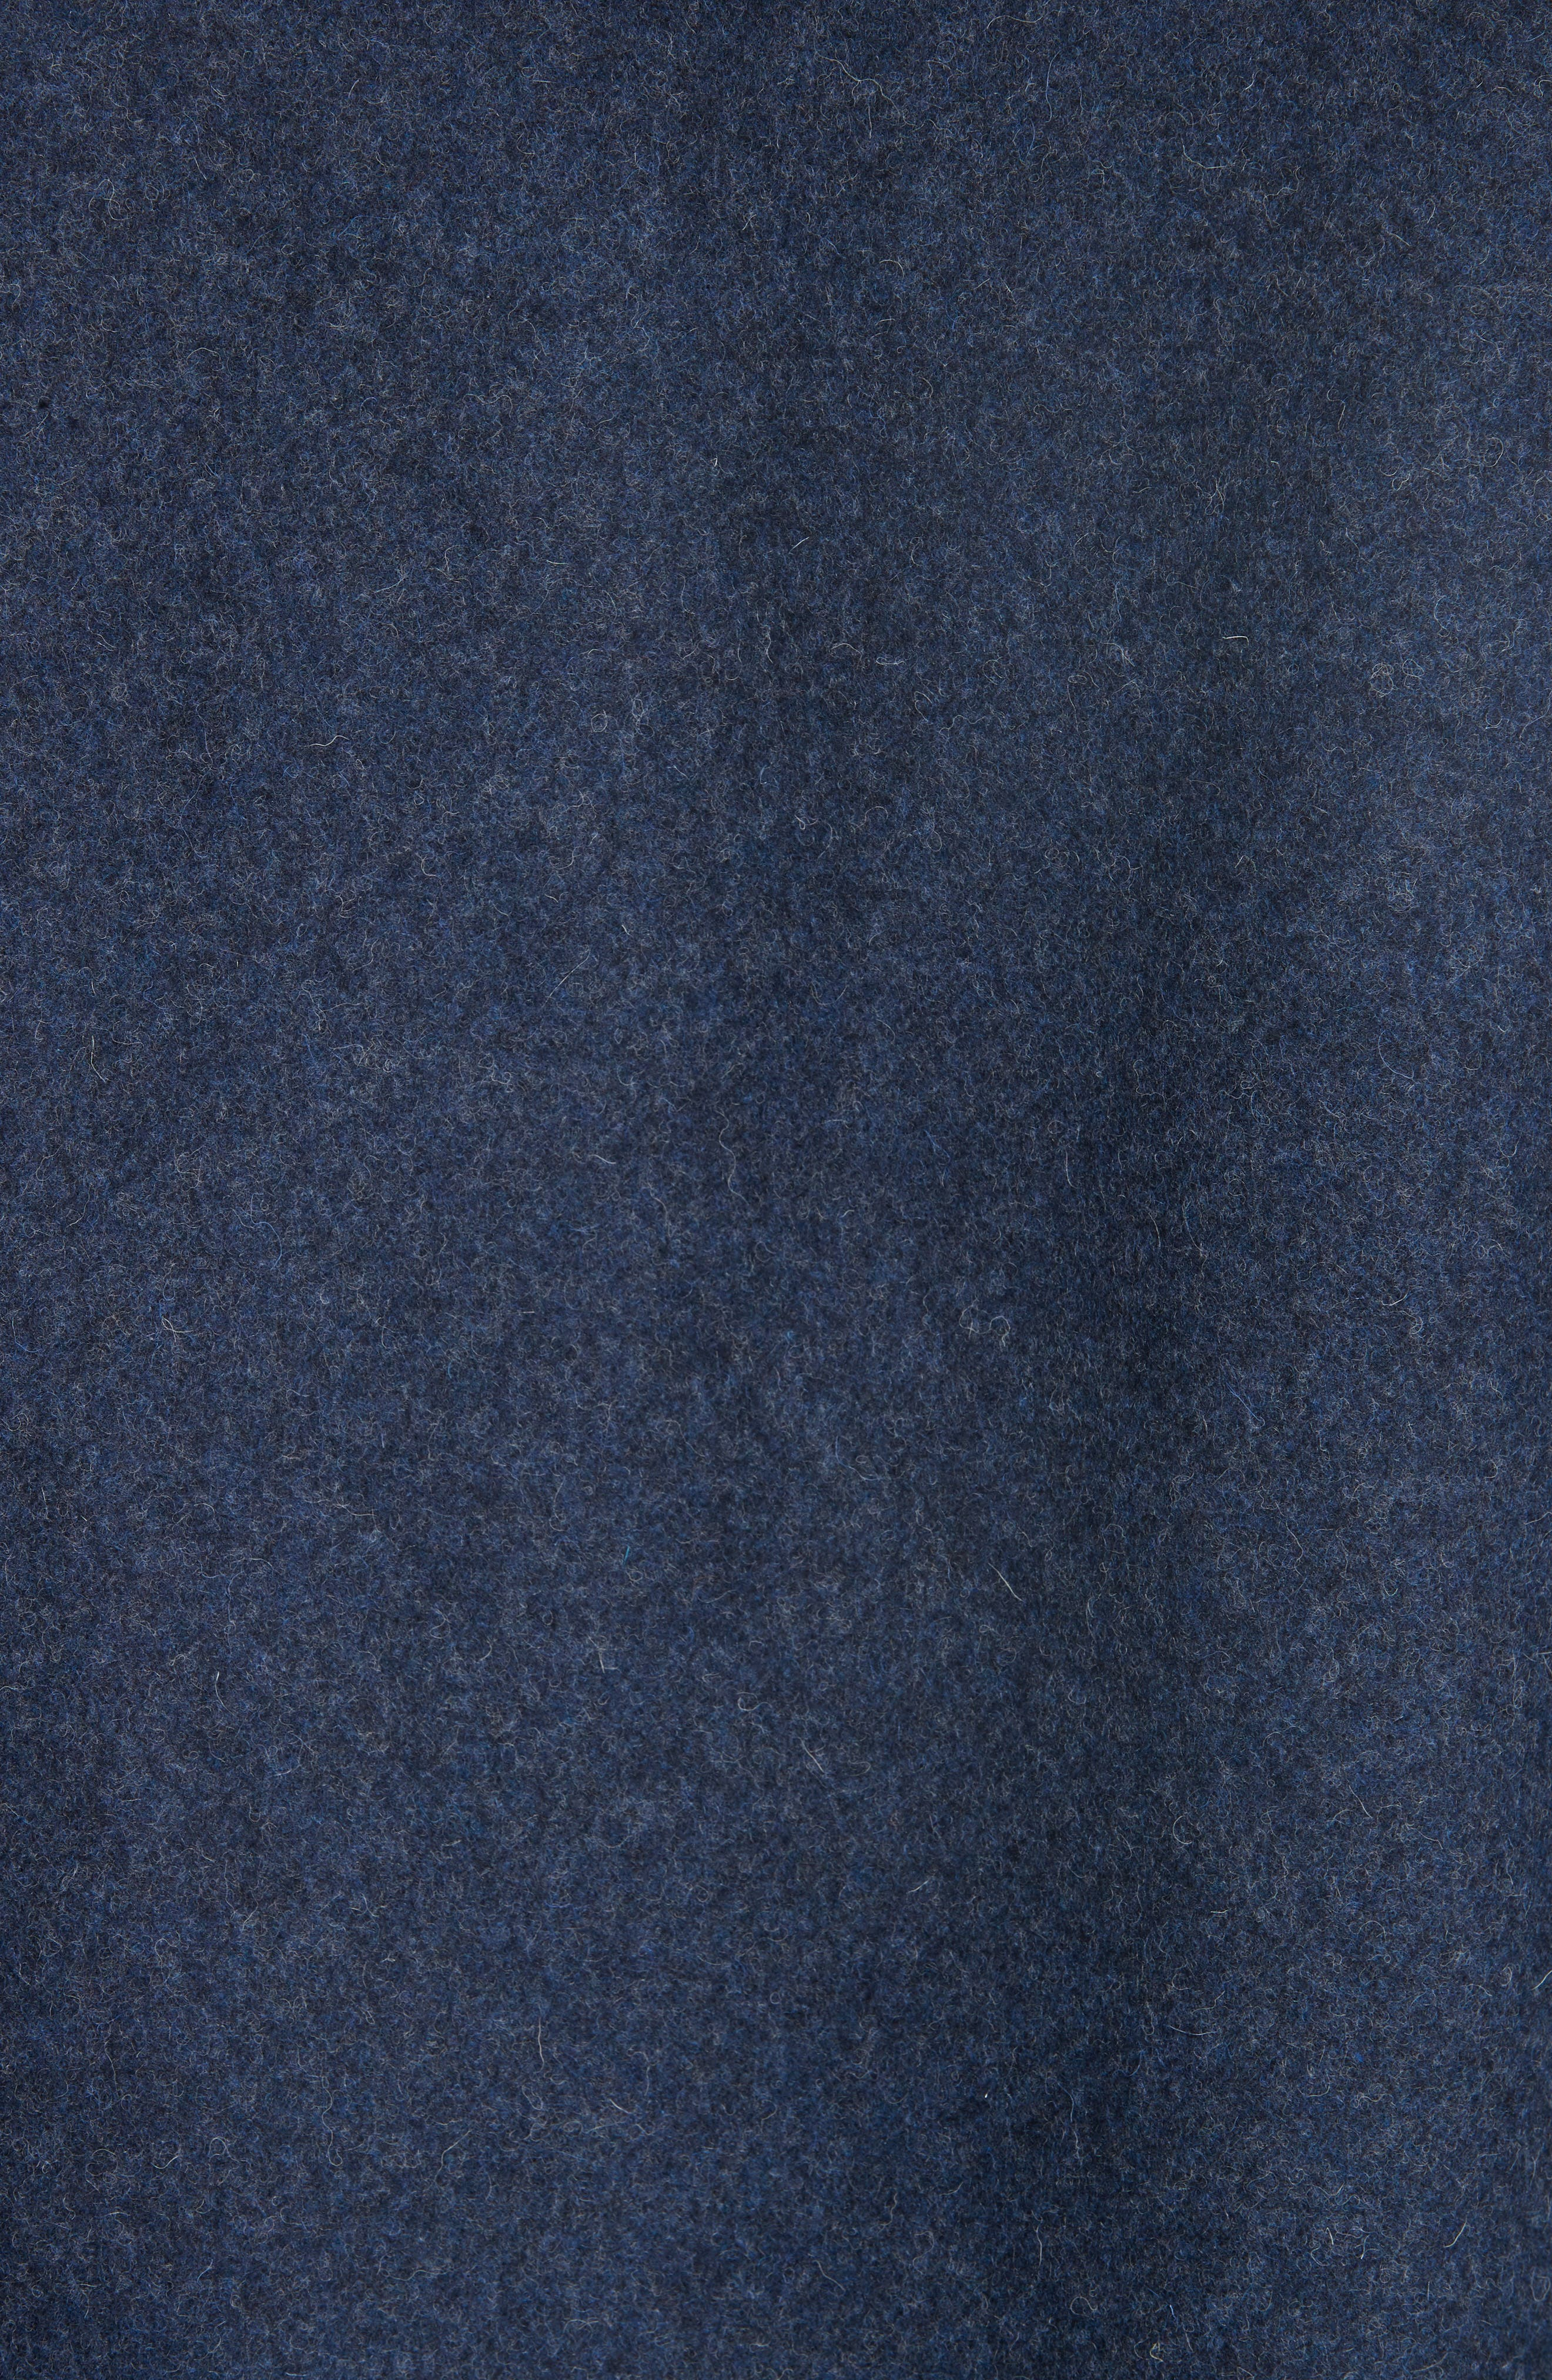 Surchemise Joe Wool Shirt,                             Alternate thumbnail 5, color,                             MARINE CHINE PIA